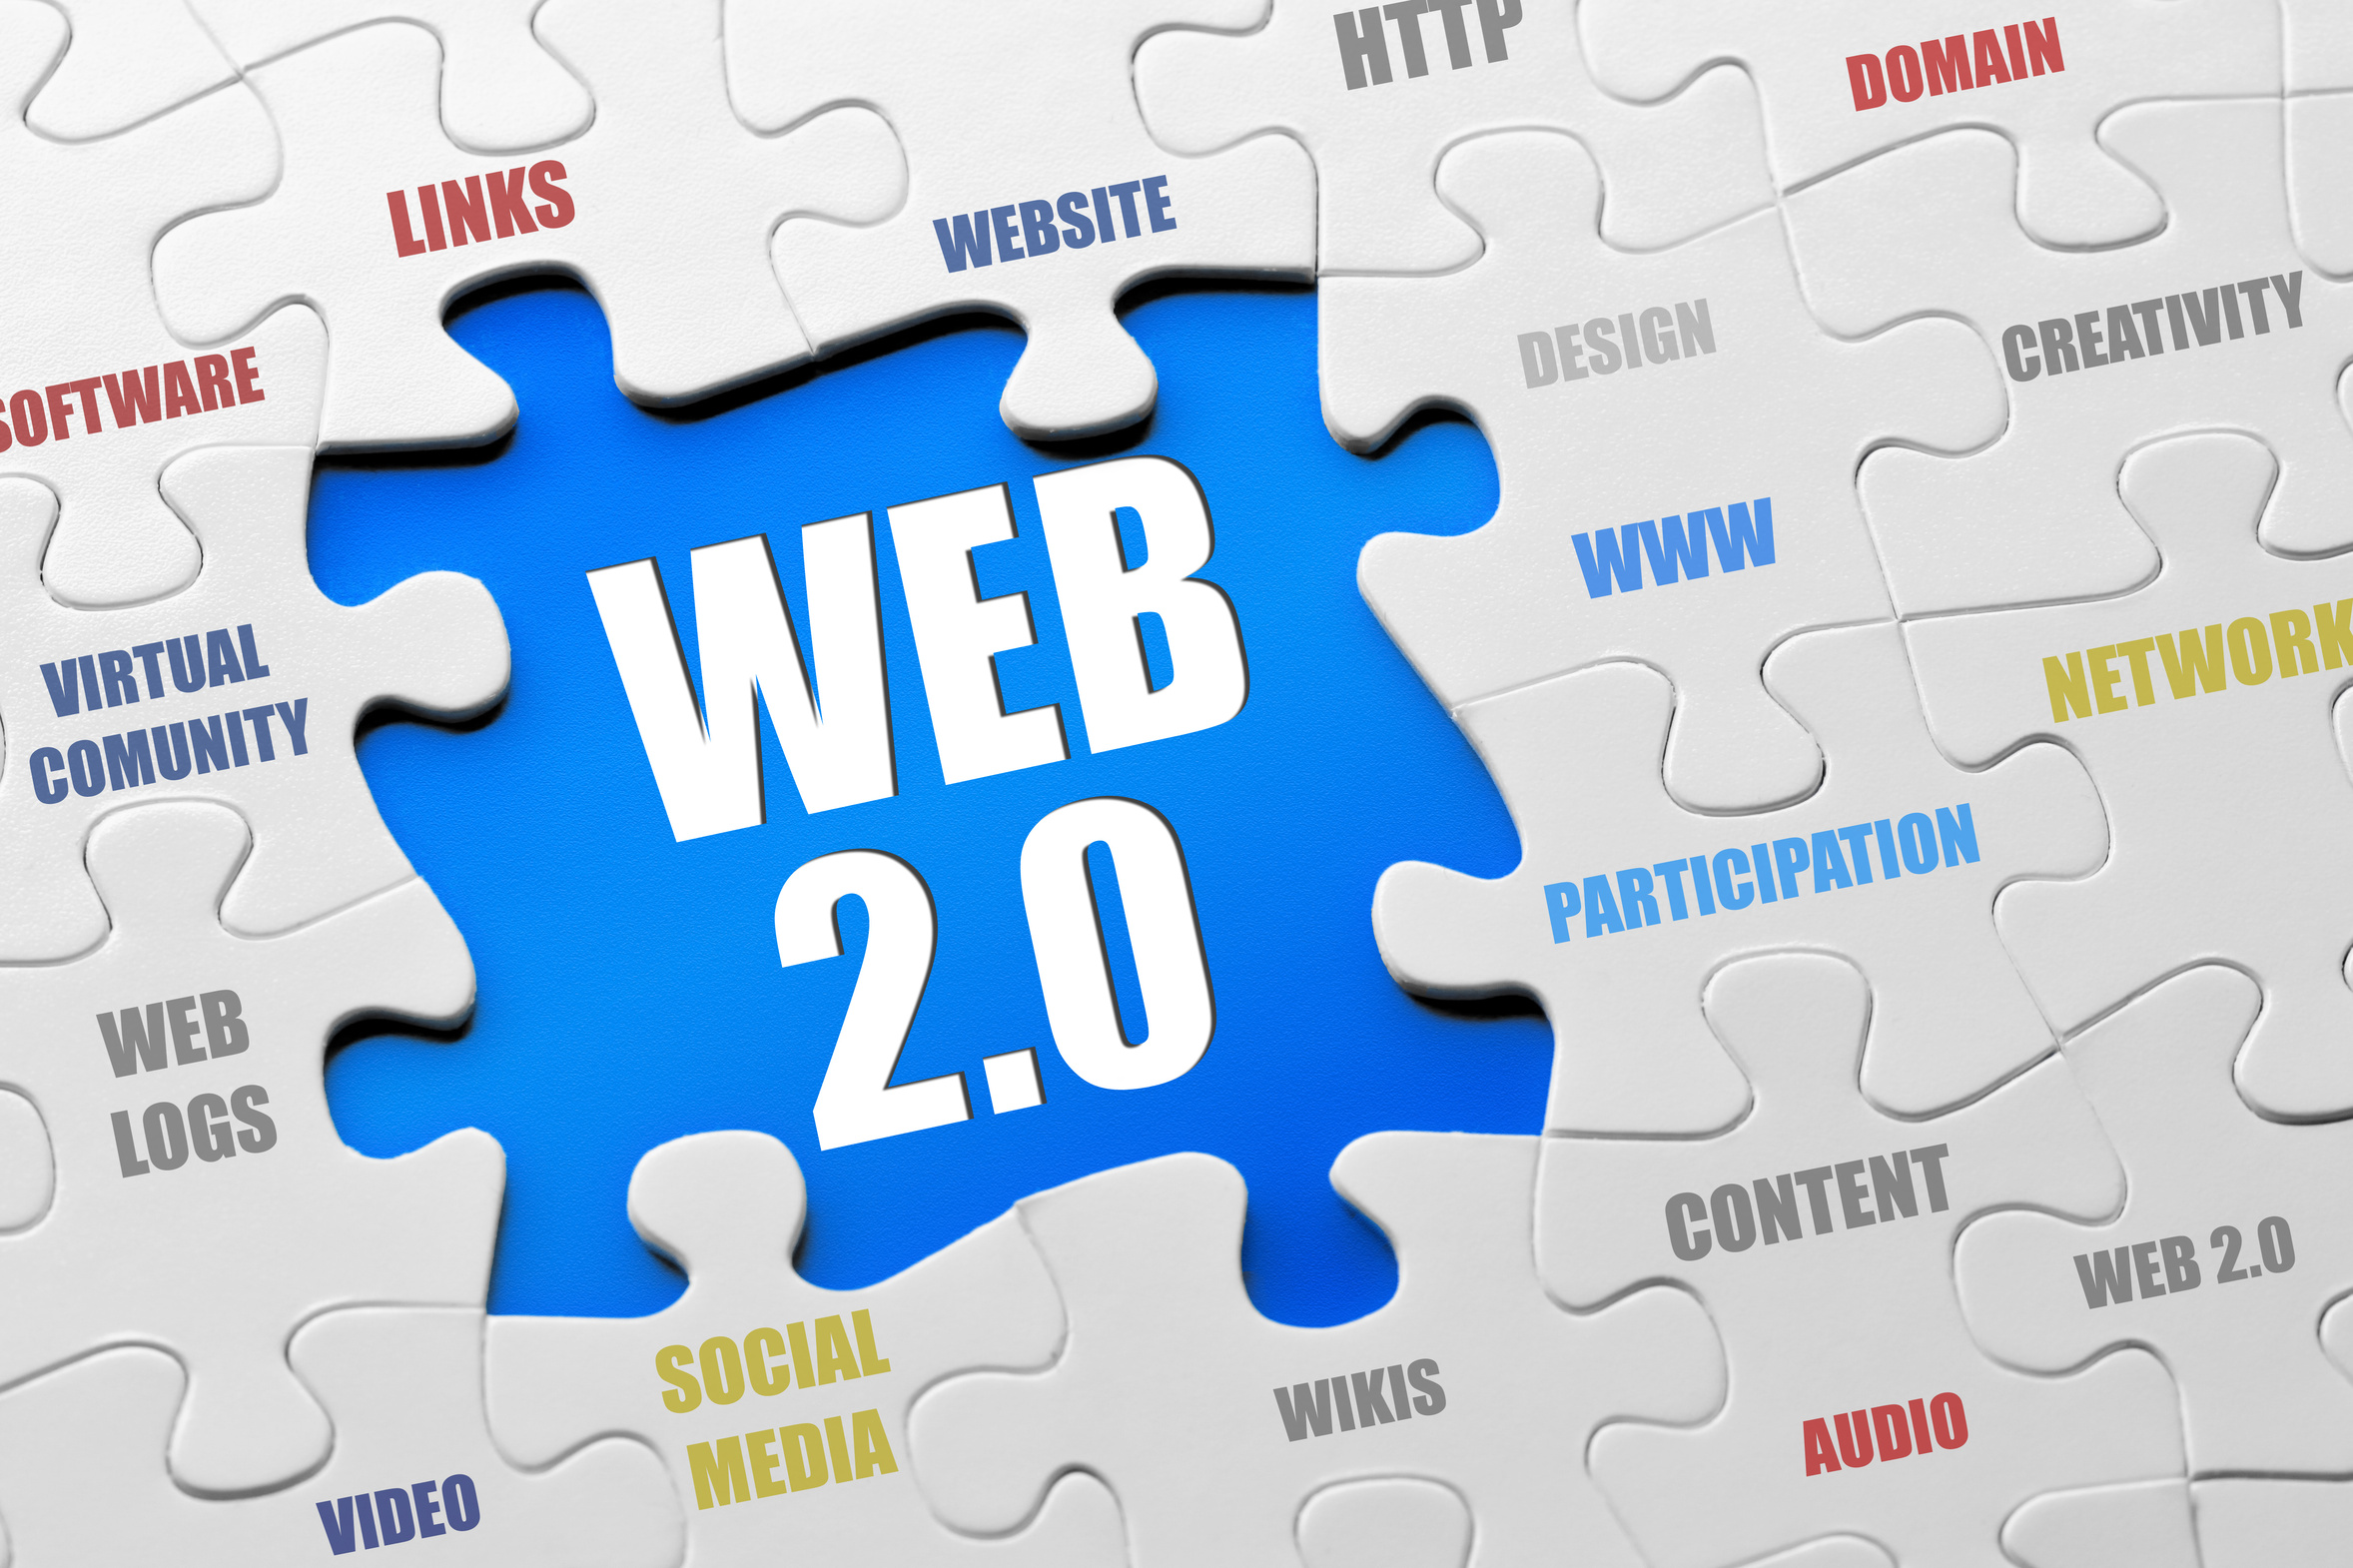 1000+ Web 2.0 Links + 10,000 Tier 2 GSA SER Links